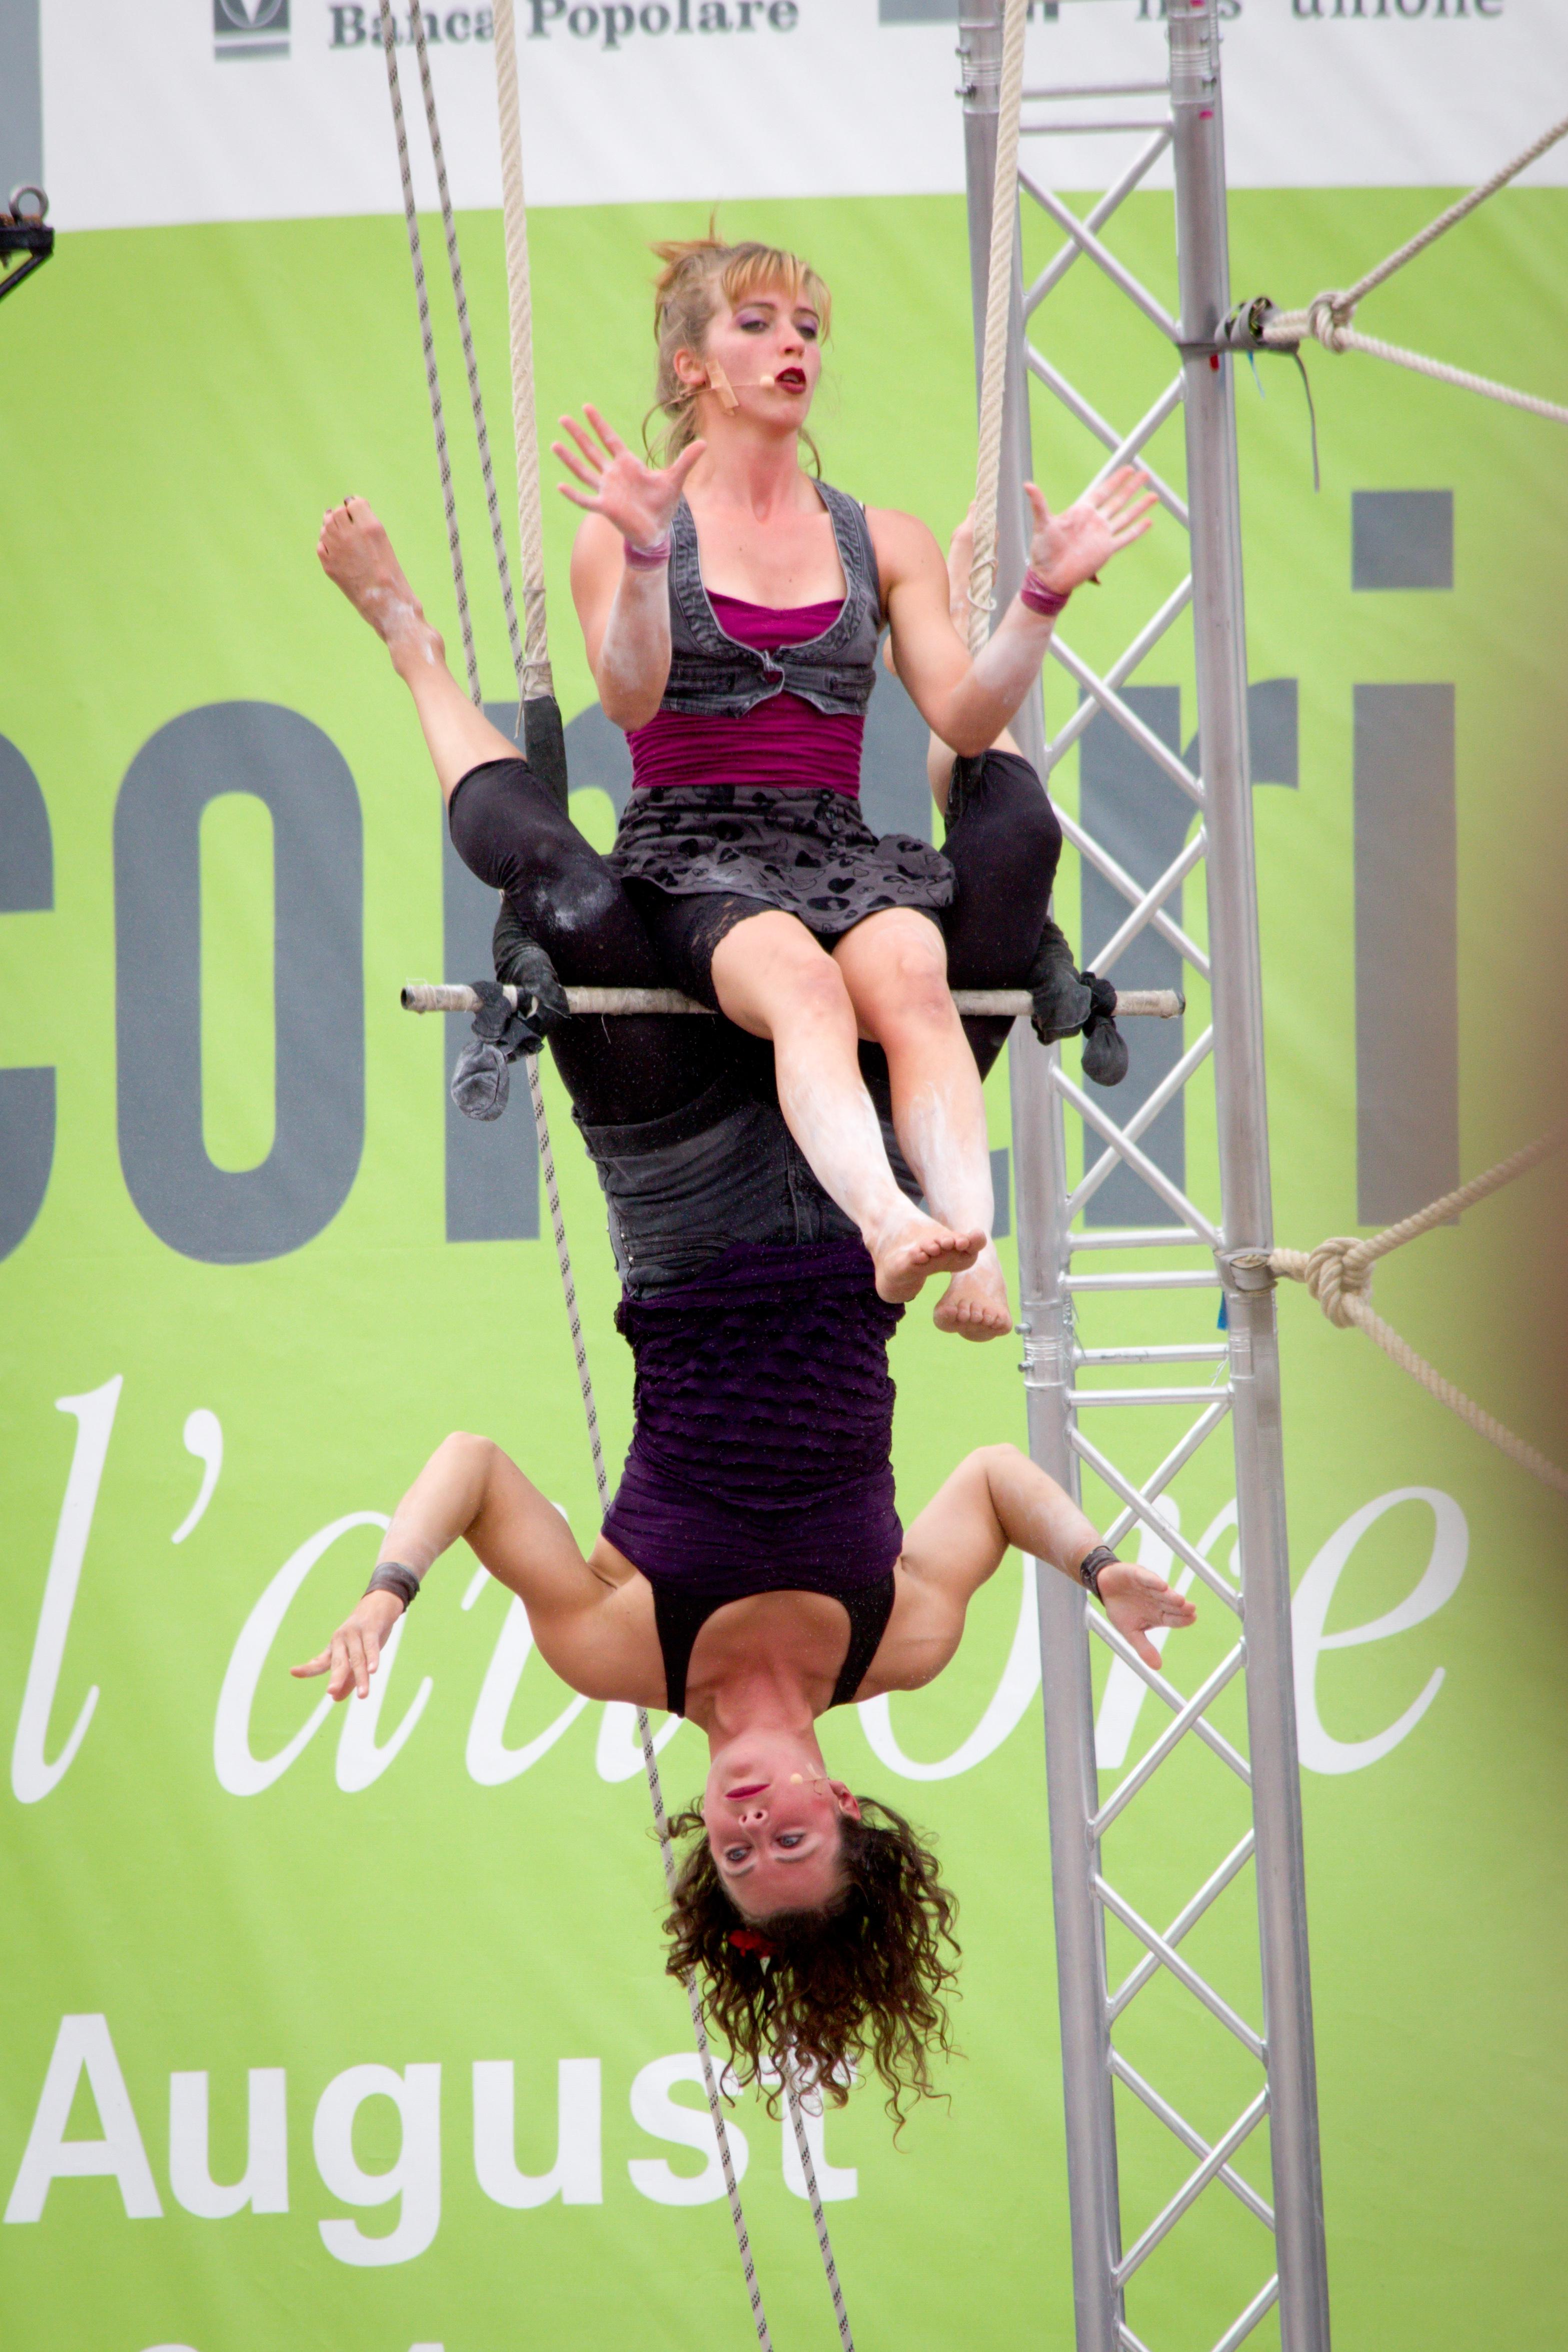 EJC 2015 Bruneck - Sunday August 2nd: Opening Gala.